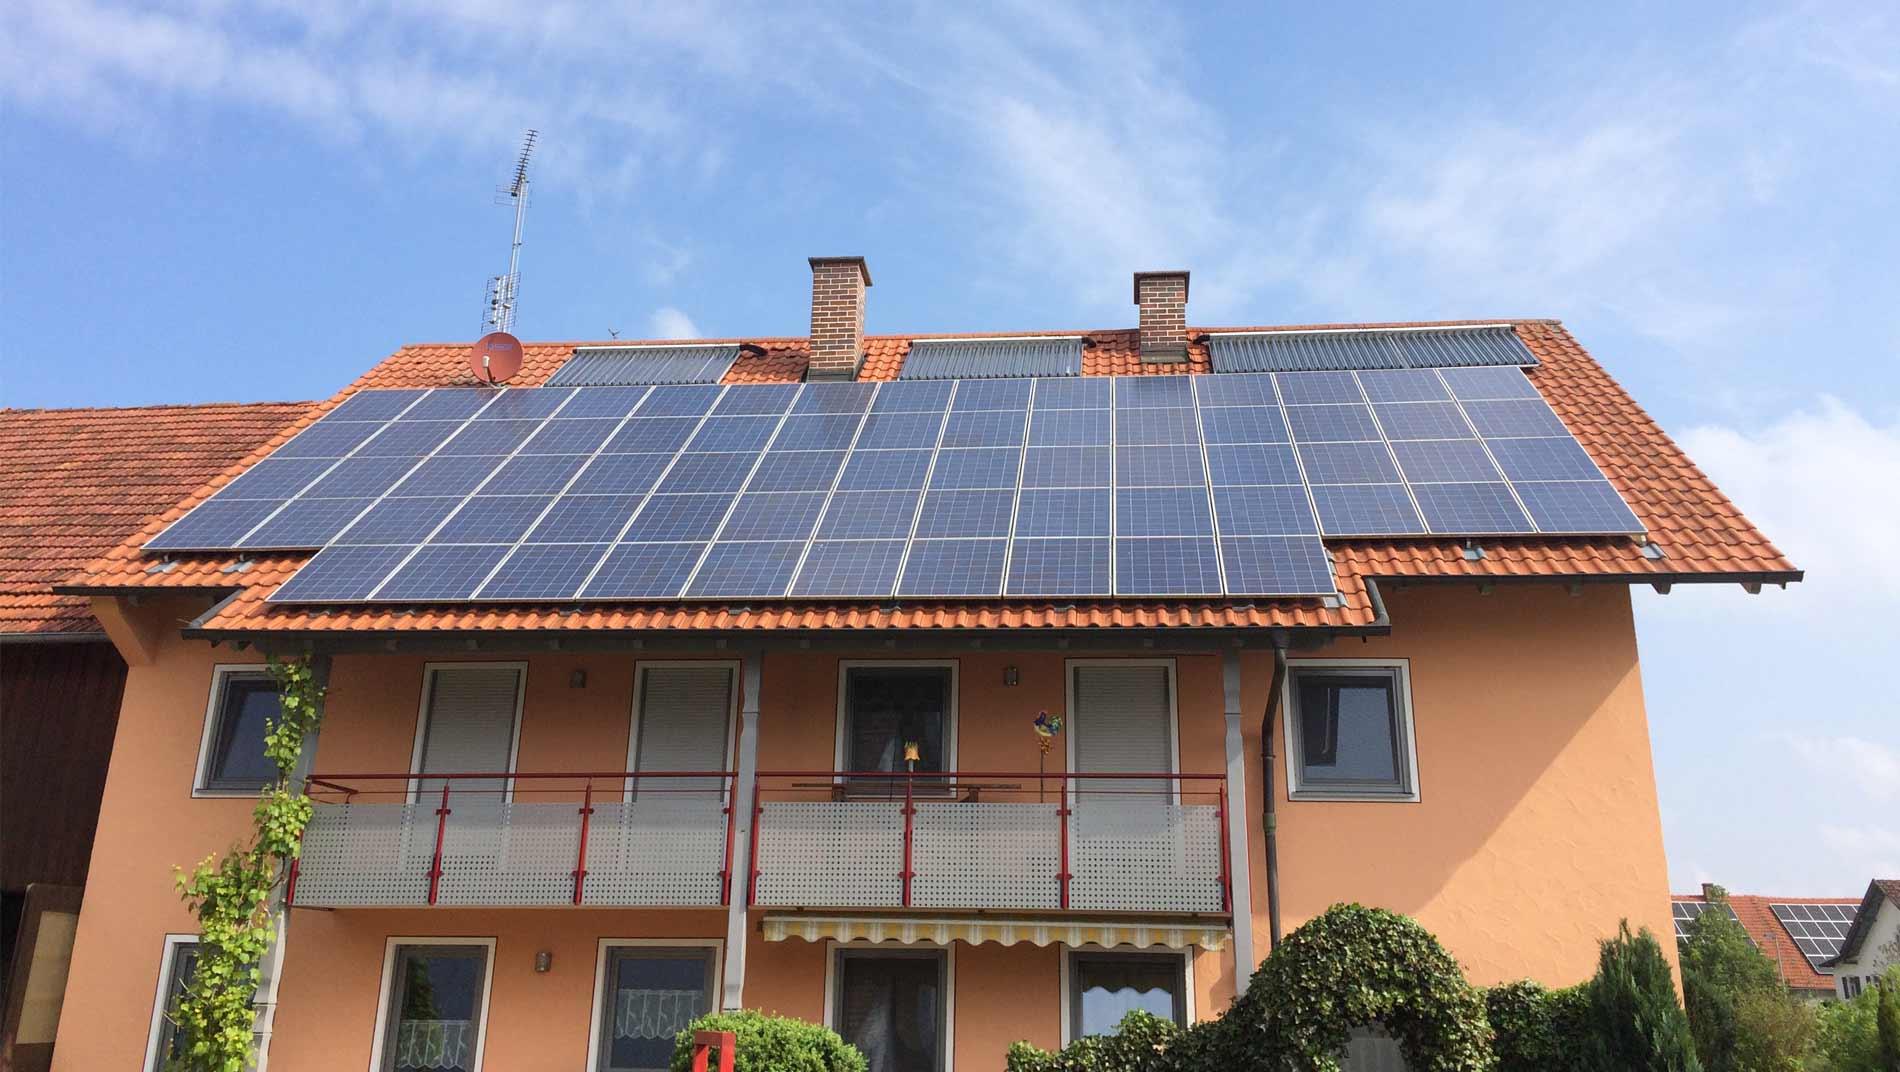 Solar-Haus: Wärme und Solarstrom